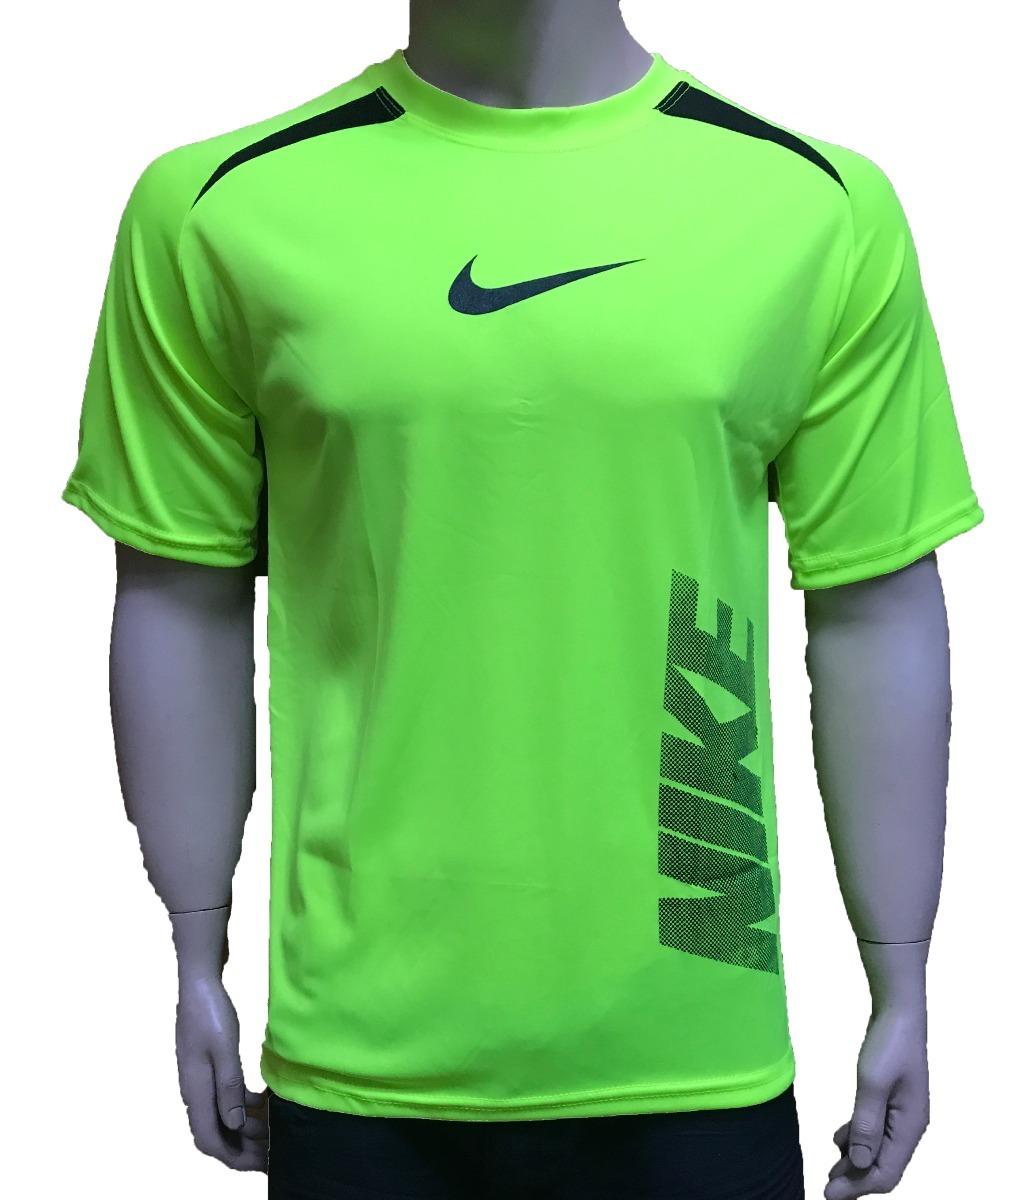 b1a7d948e8 Kit 10 Camisetas Camisa Dry Fit Academia Trein Revenda Lucre - R ...